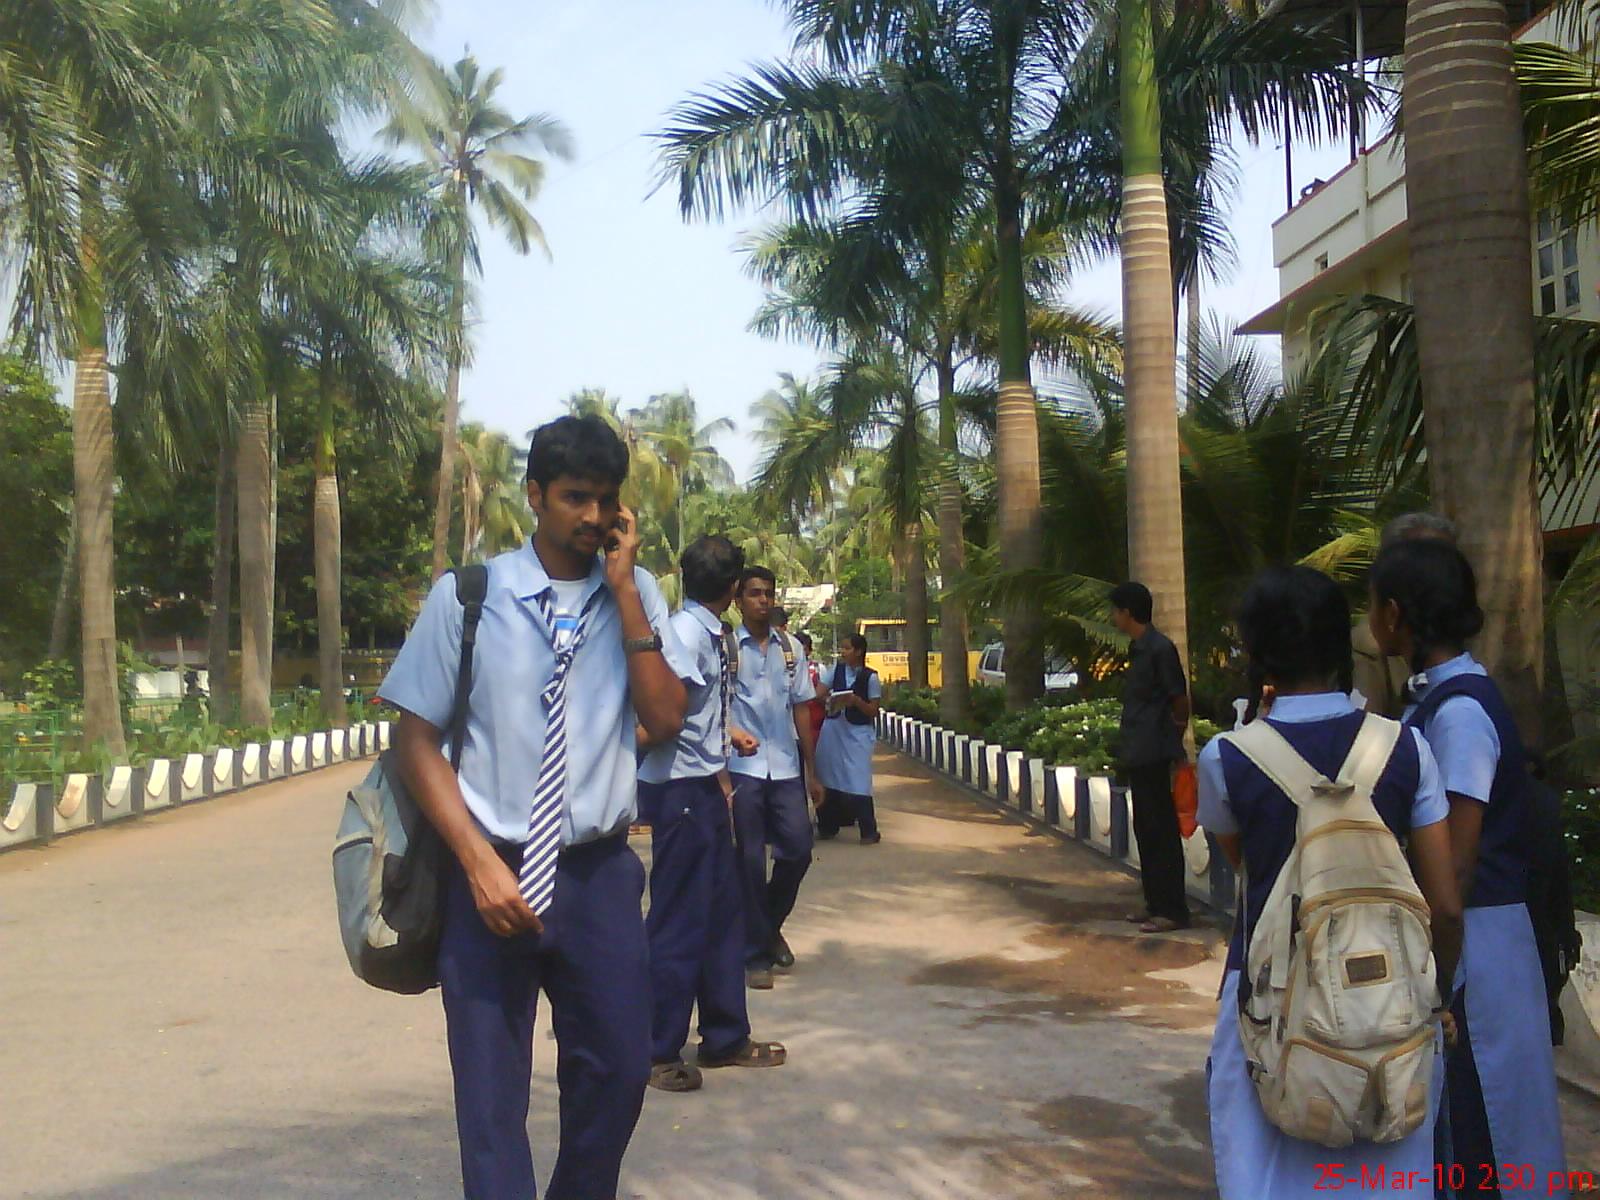 Schools in the Marshalls